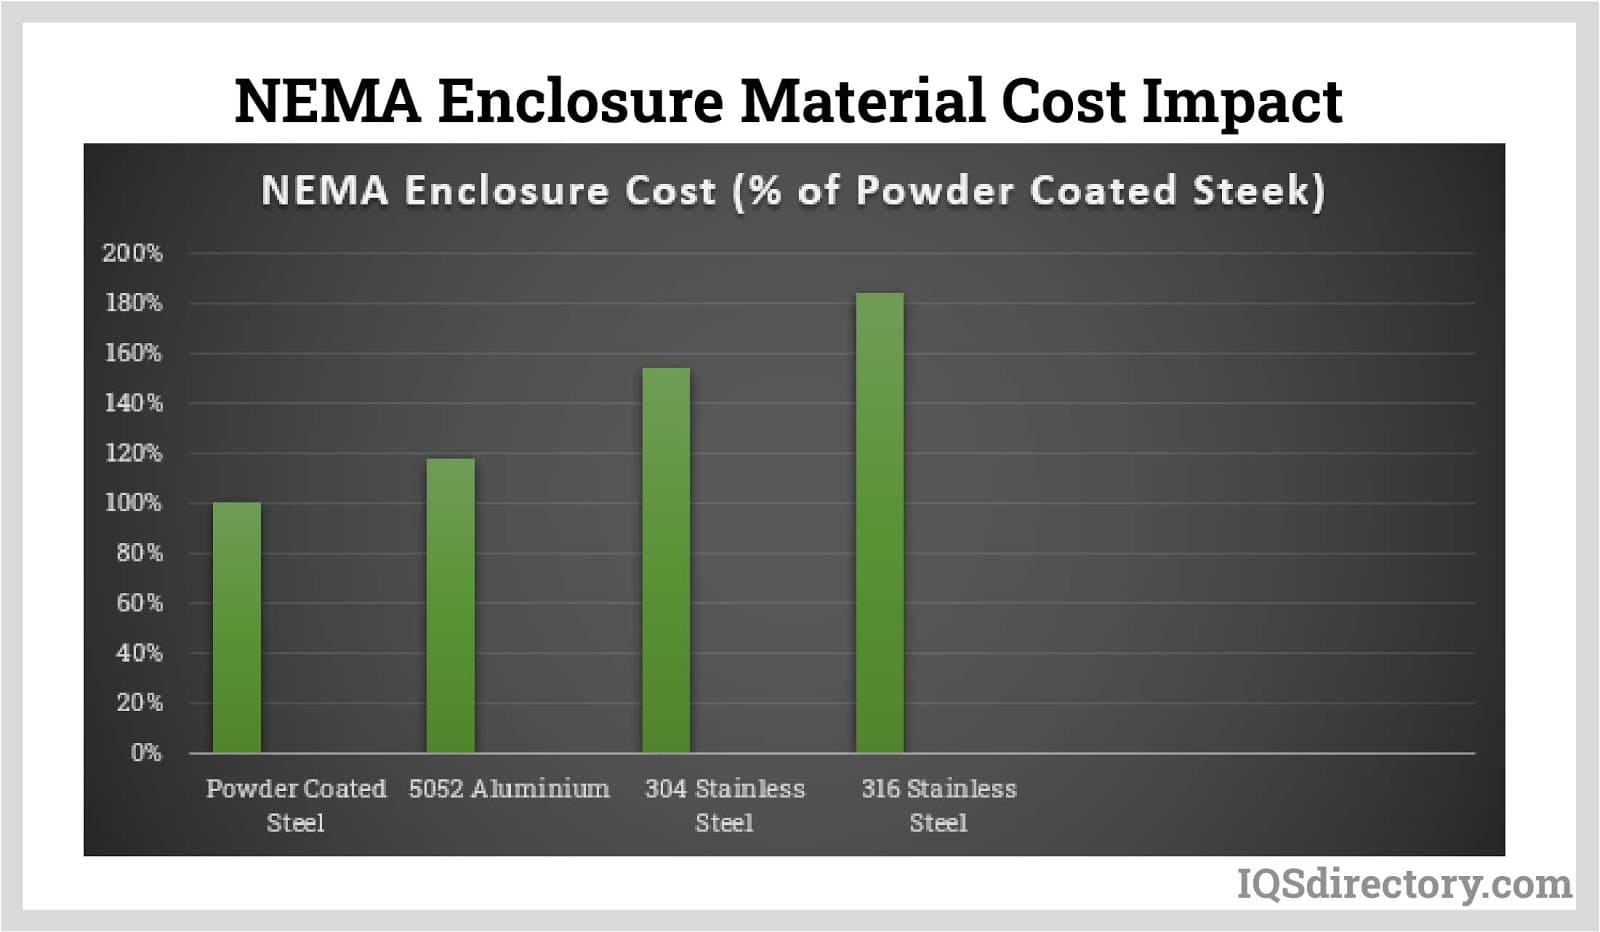 NEMA Enclosure Material Cost Impact